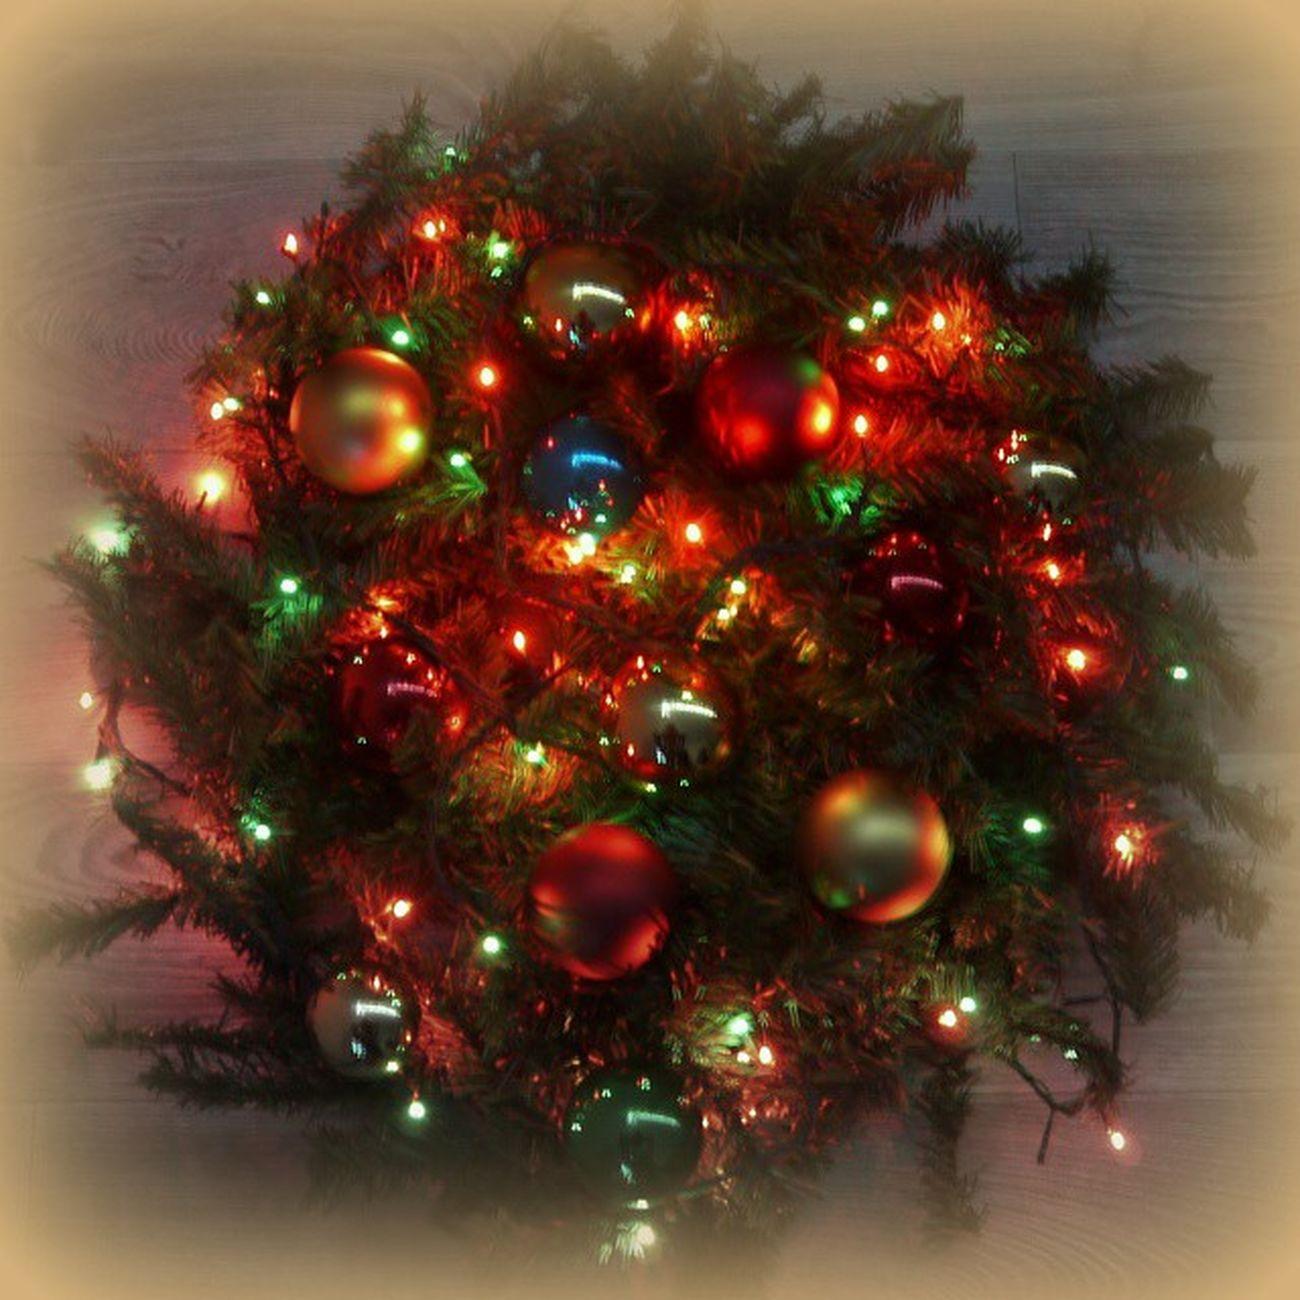 омск сибирь новыйгод рождество ёлка венок гирлянда NewYear Christmastree Christmas Swag Wreath